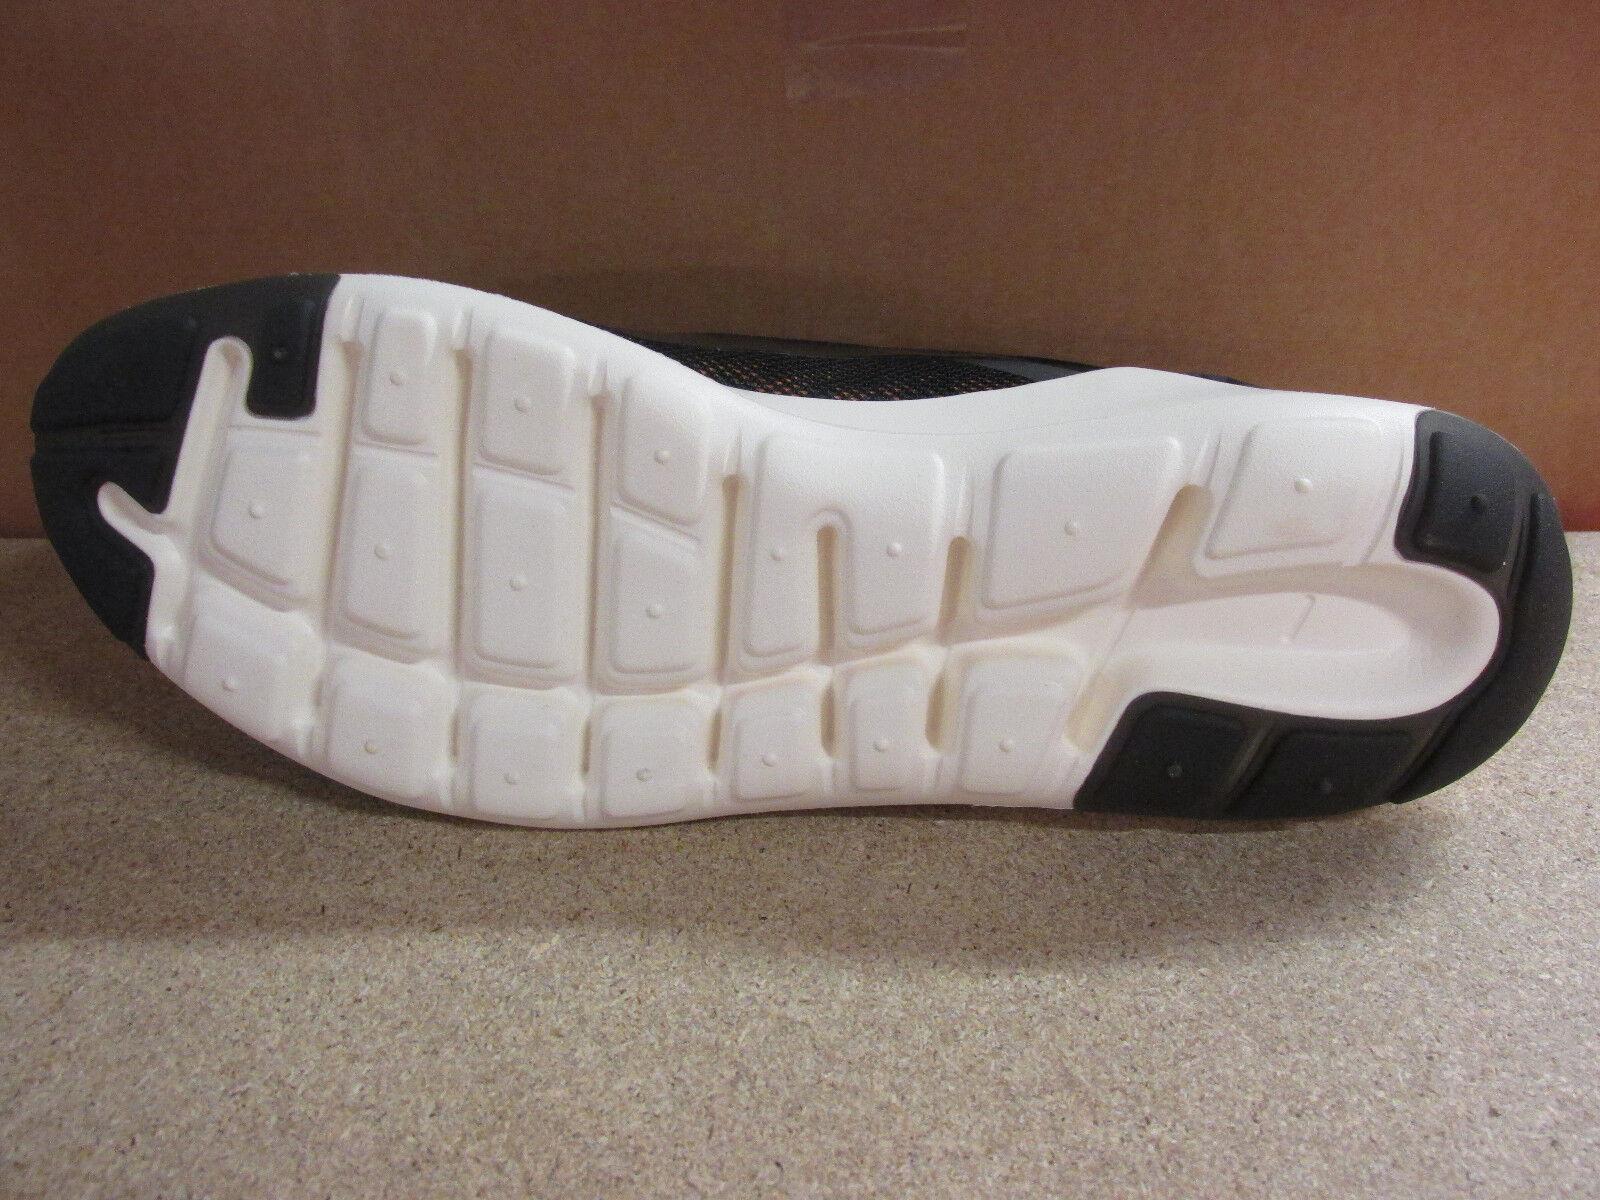 Nike Lunarestoa 2 Qs Premium Scarpe Sportive Uomo Uomo Uomo 807791 008 Scarpe da Tennis 562f26